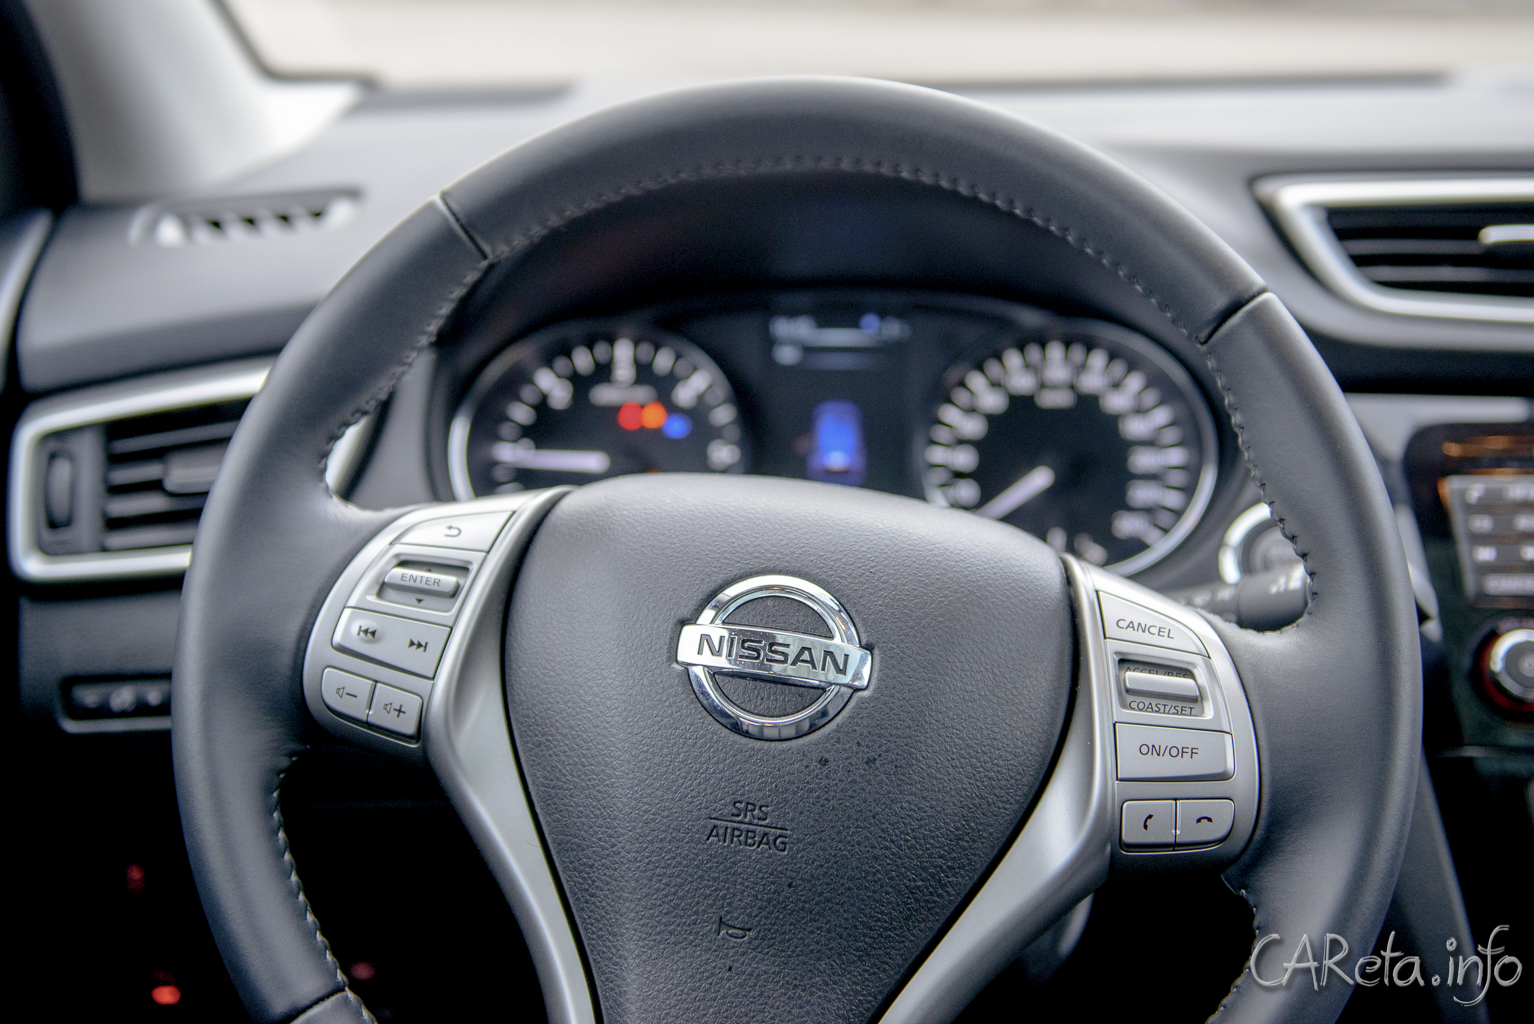 Тест-драйв Nissan Qashqai: Как я полюбила японские автомобили